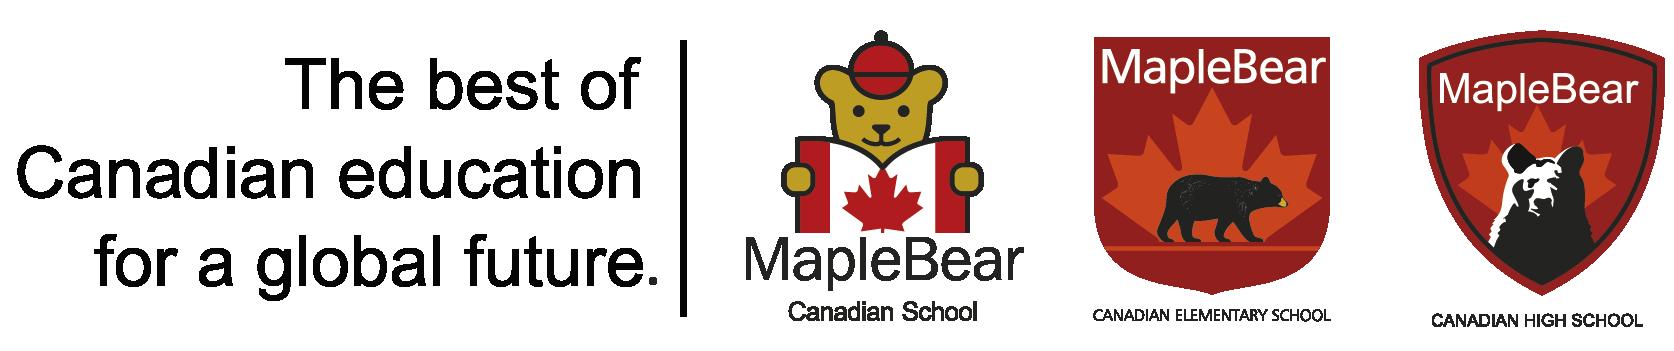 Maple Bear Lomas Verdes